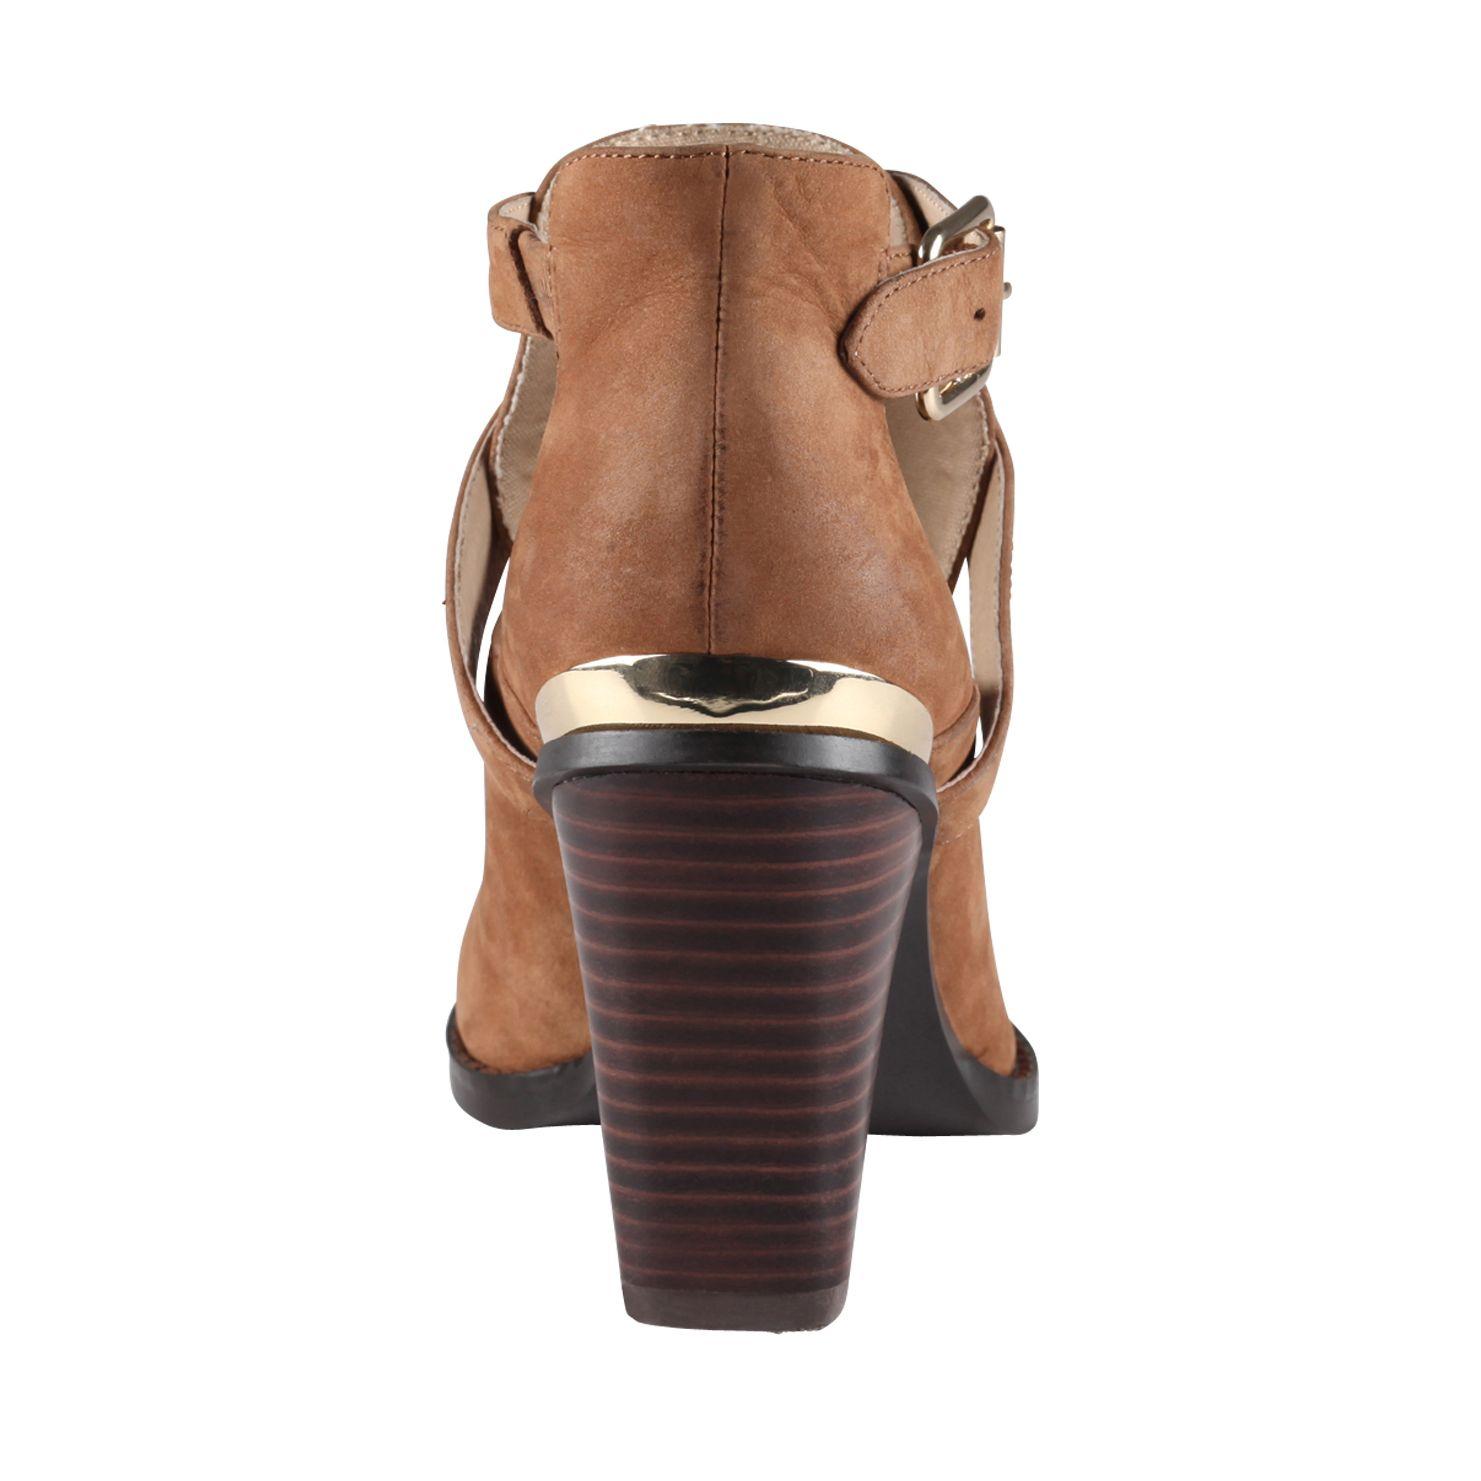 ALDO Moulisova Ankle Boots in Cognac (Brown)